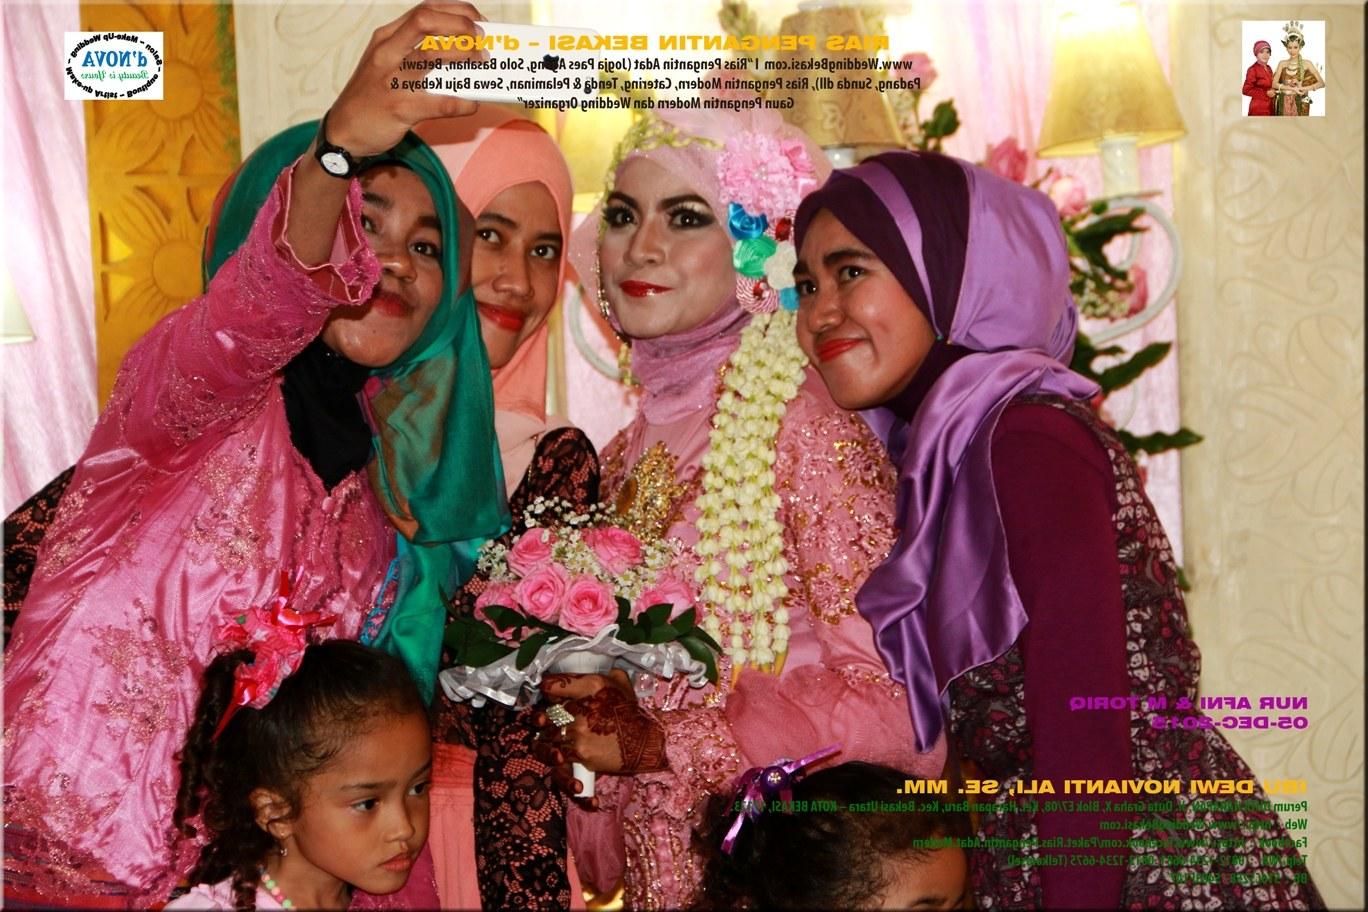 Bentuk Sewa Gaun Pengantin Muslimah Jogja Fmdf Kebaya Pengantin Pink Fanta Vkebaya